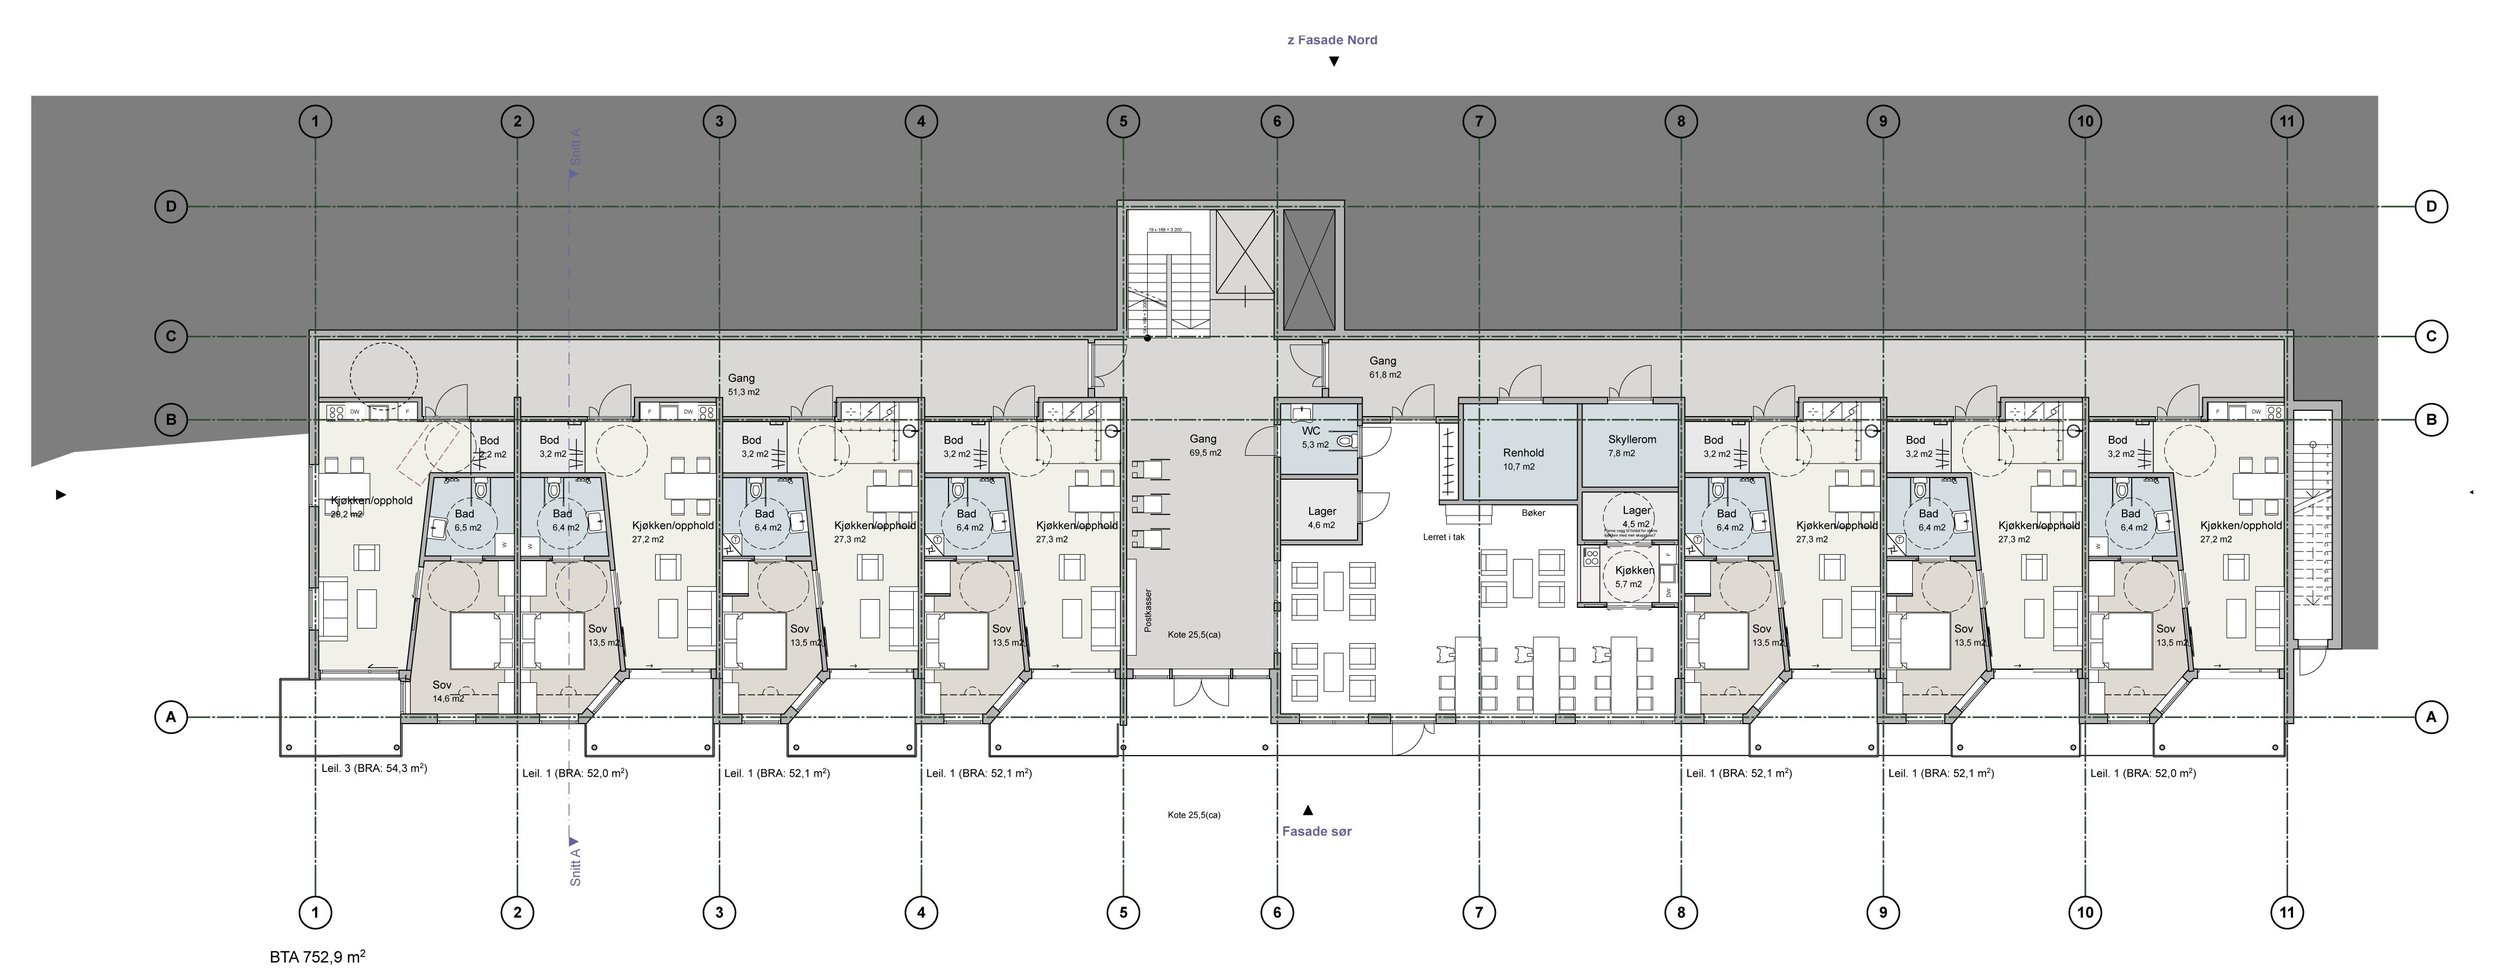 A20-3 Plan.jpg